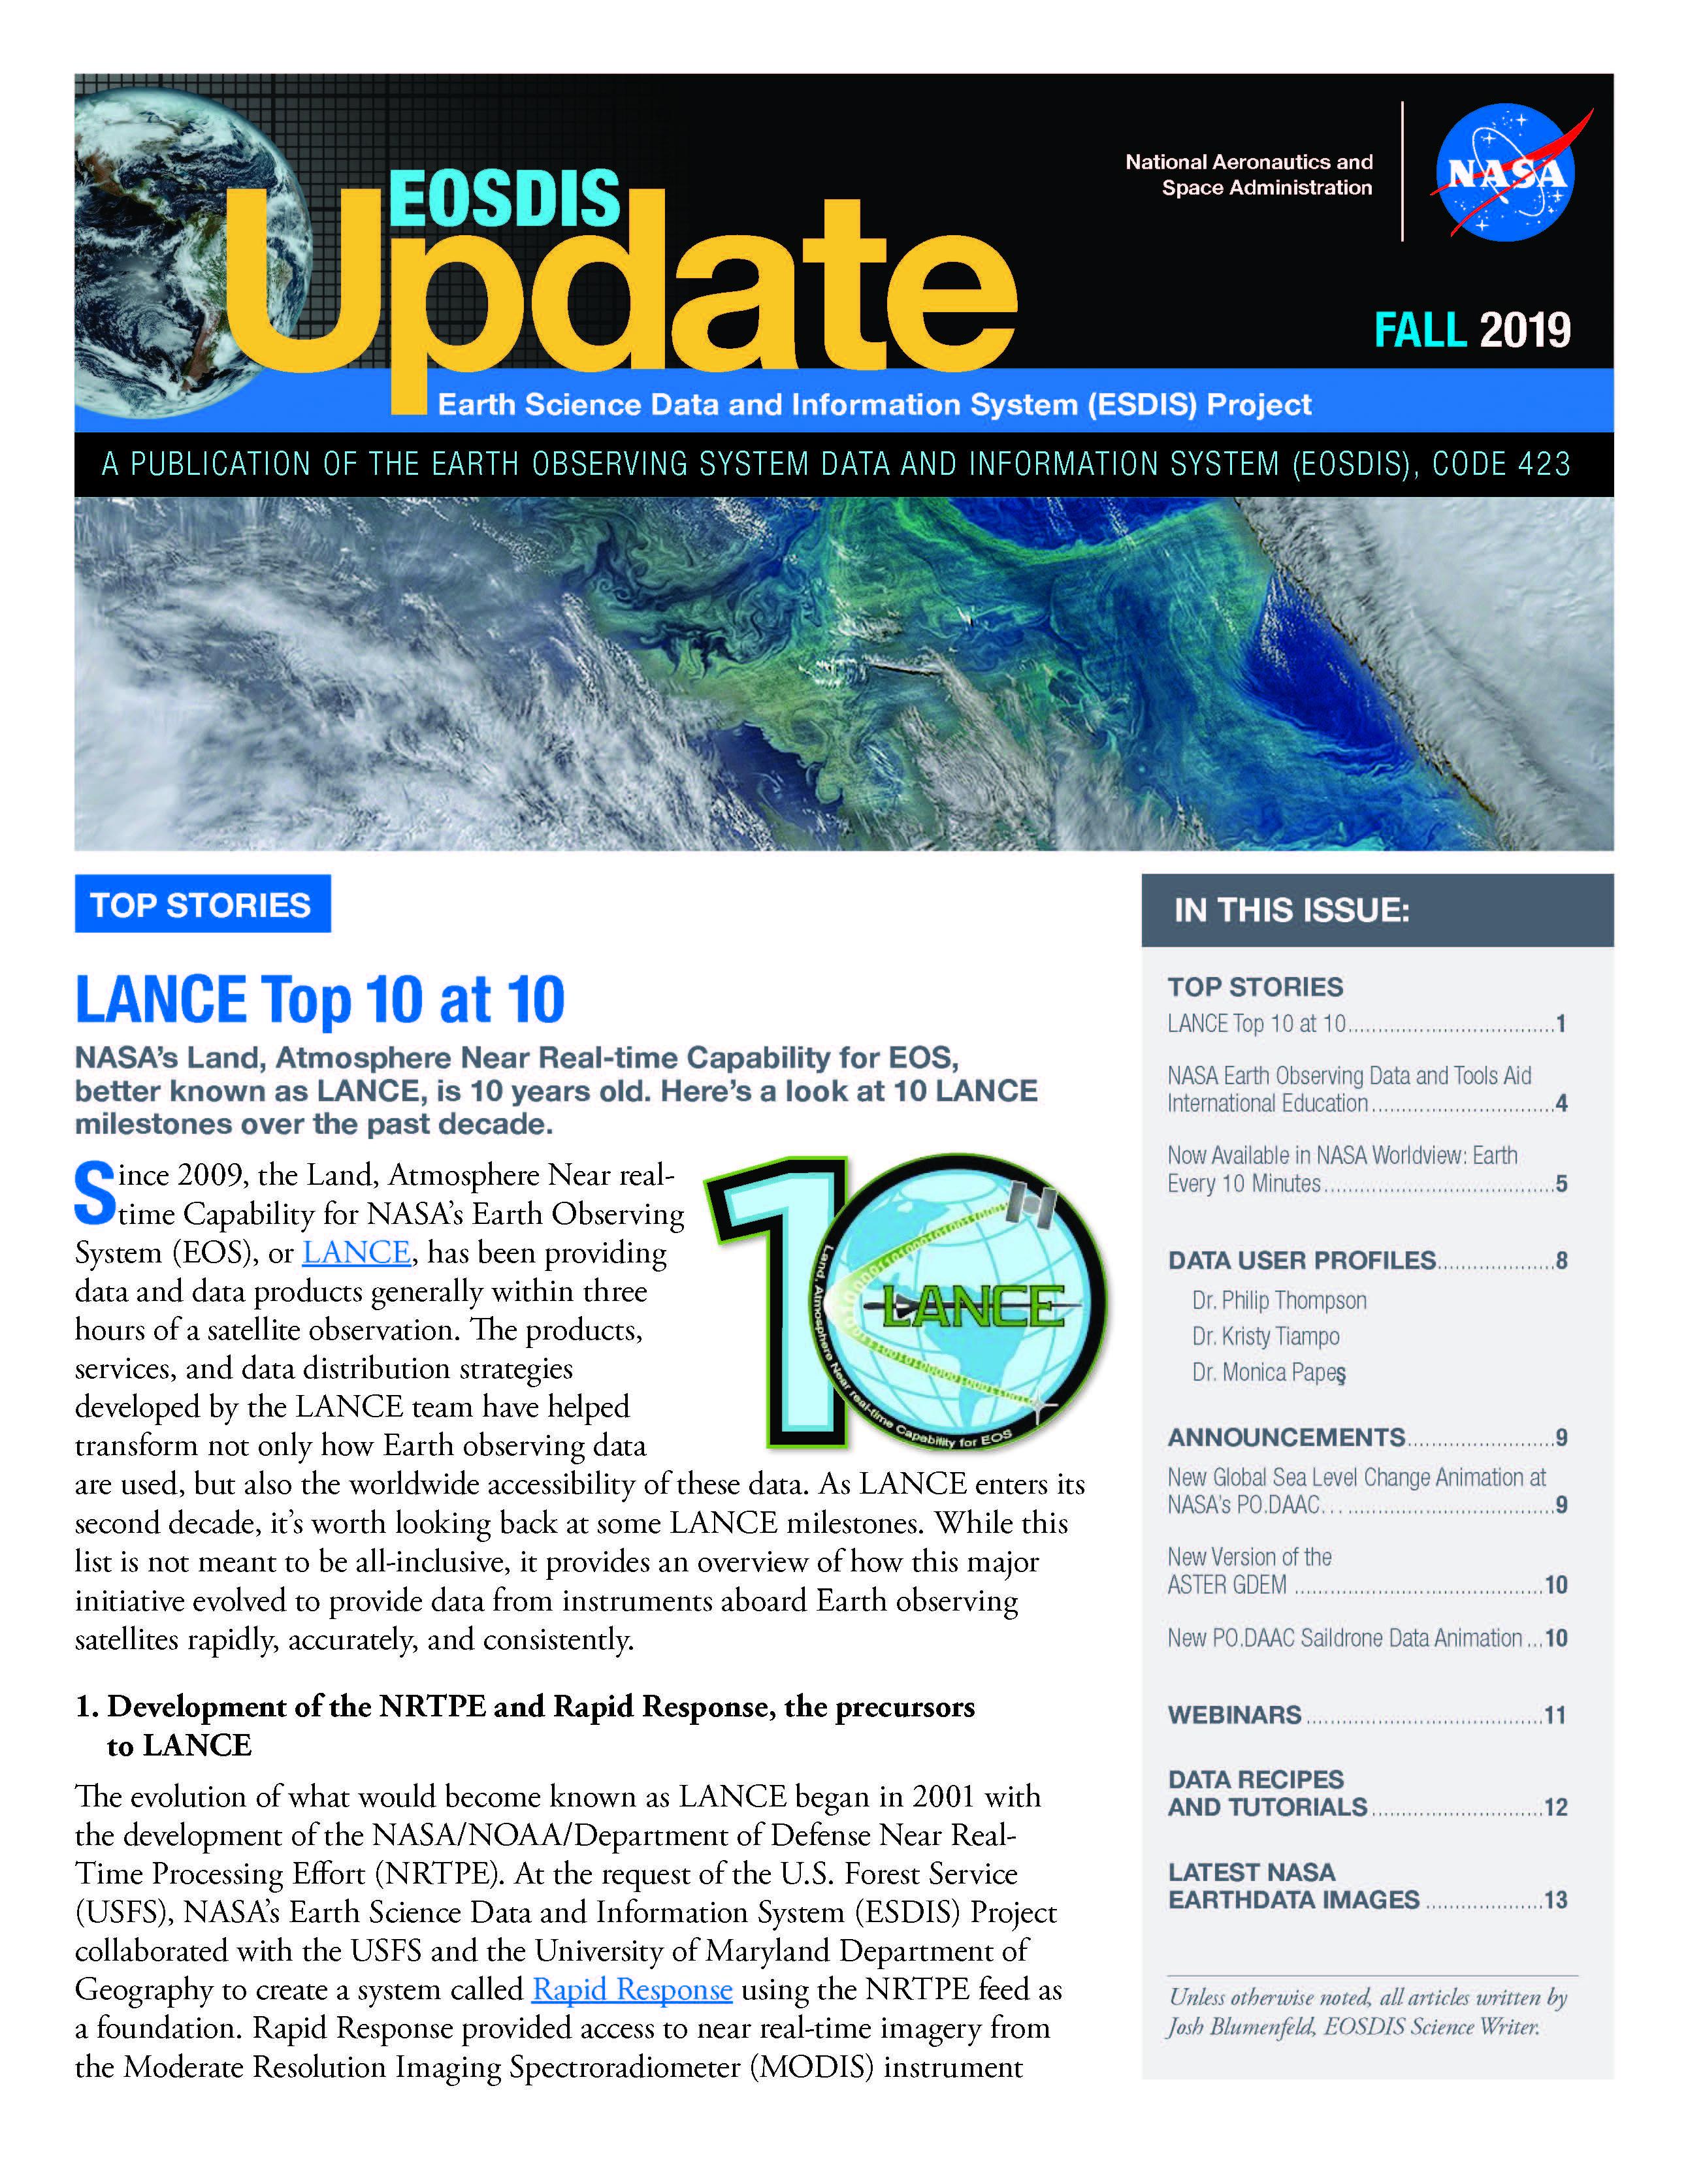 EOSDIS Quarterly Update- Fall 2019 Newsletter Cover Image